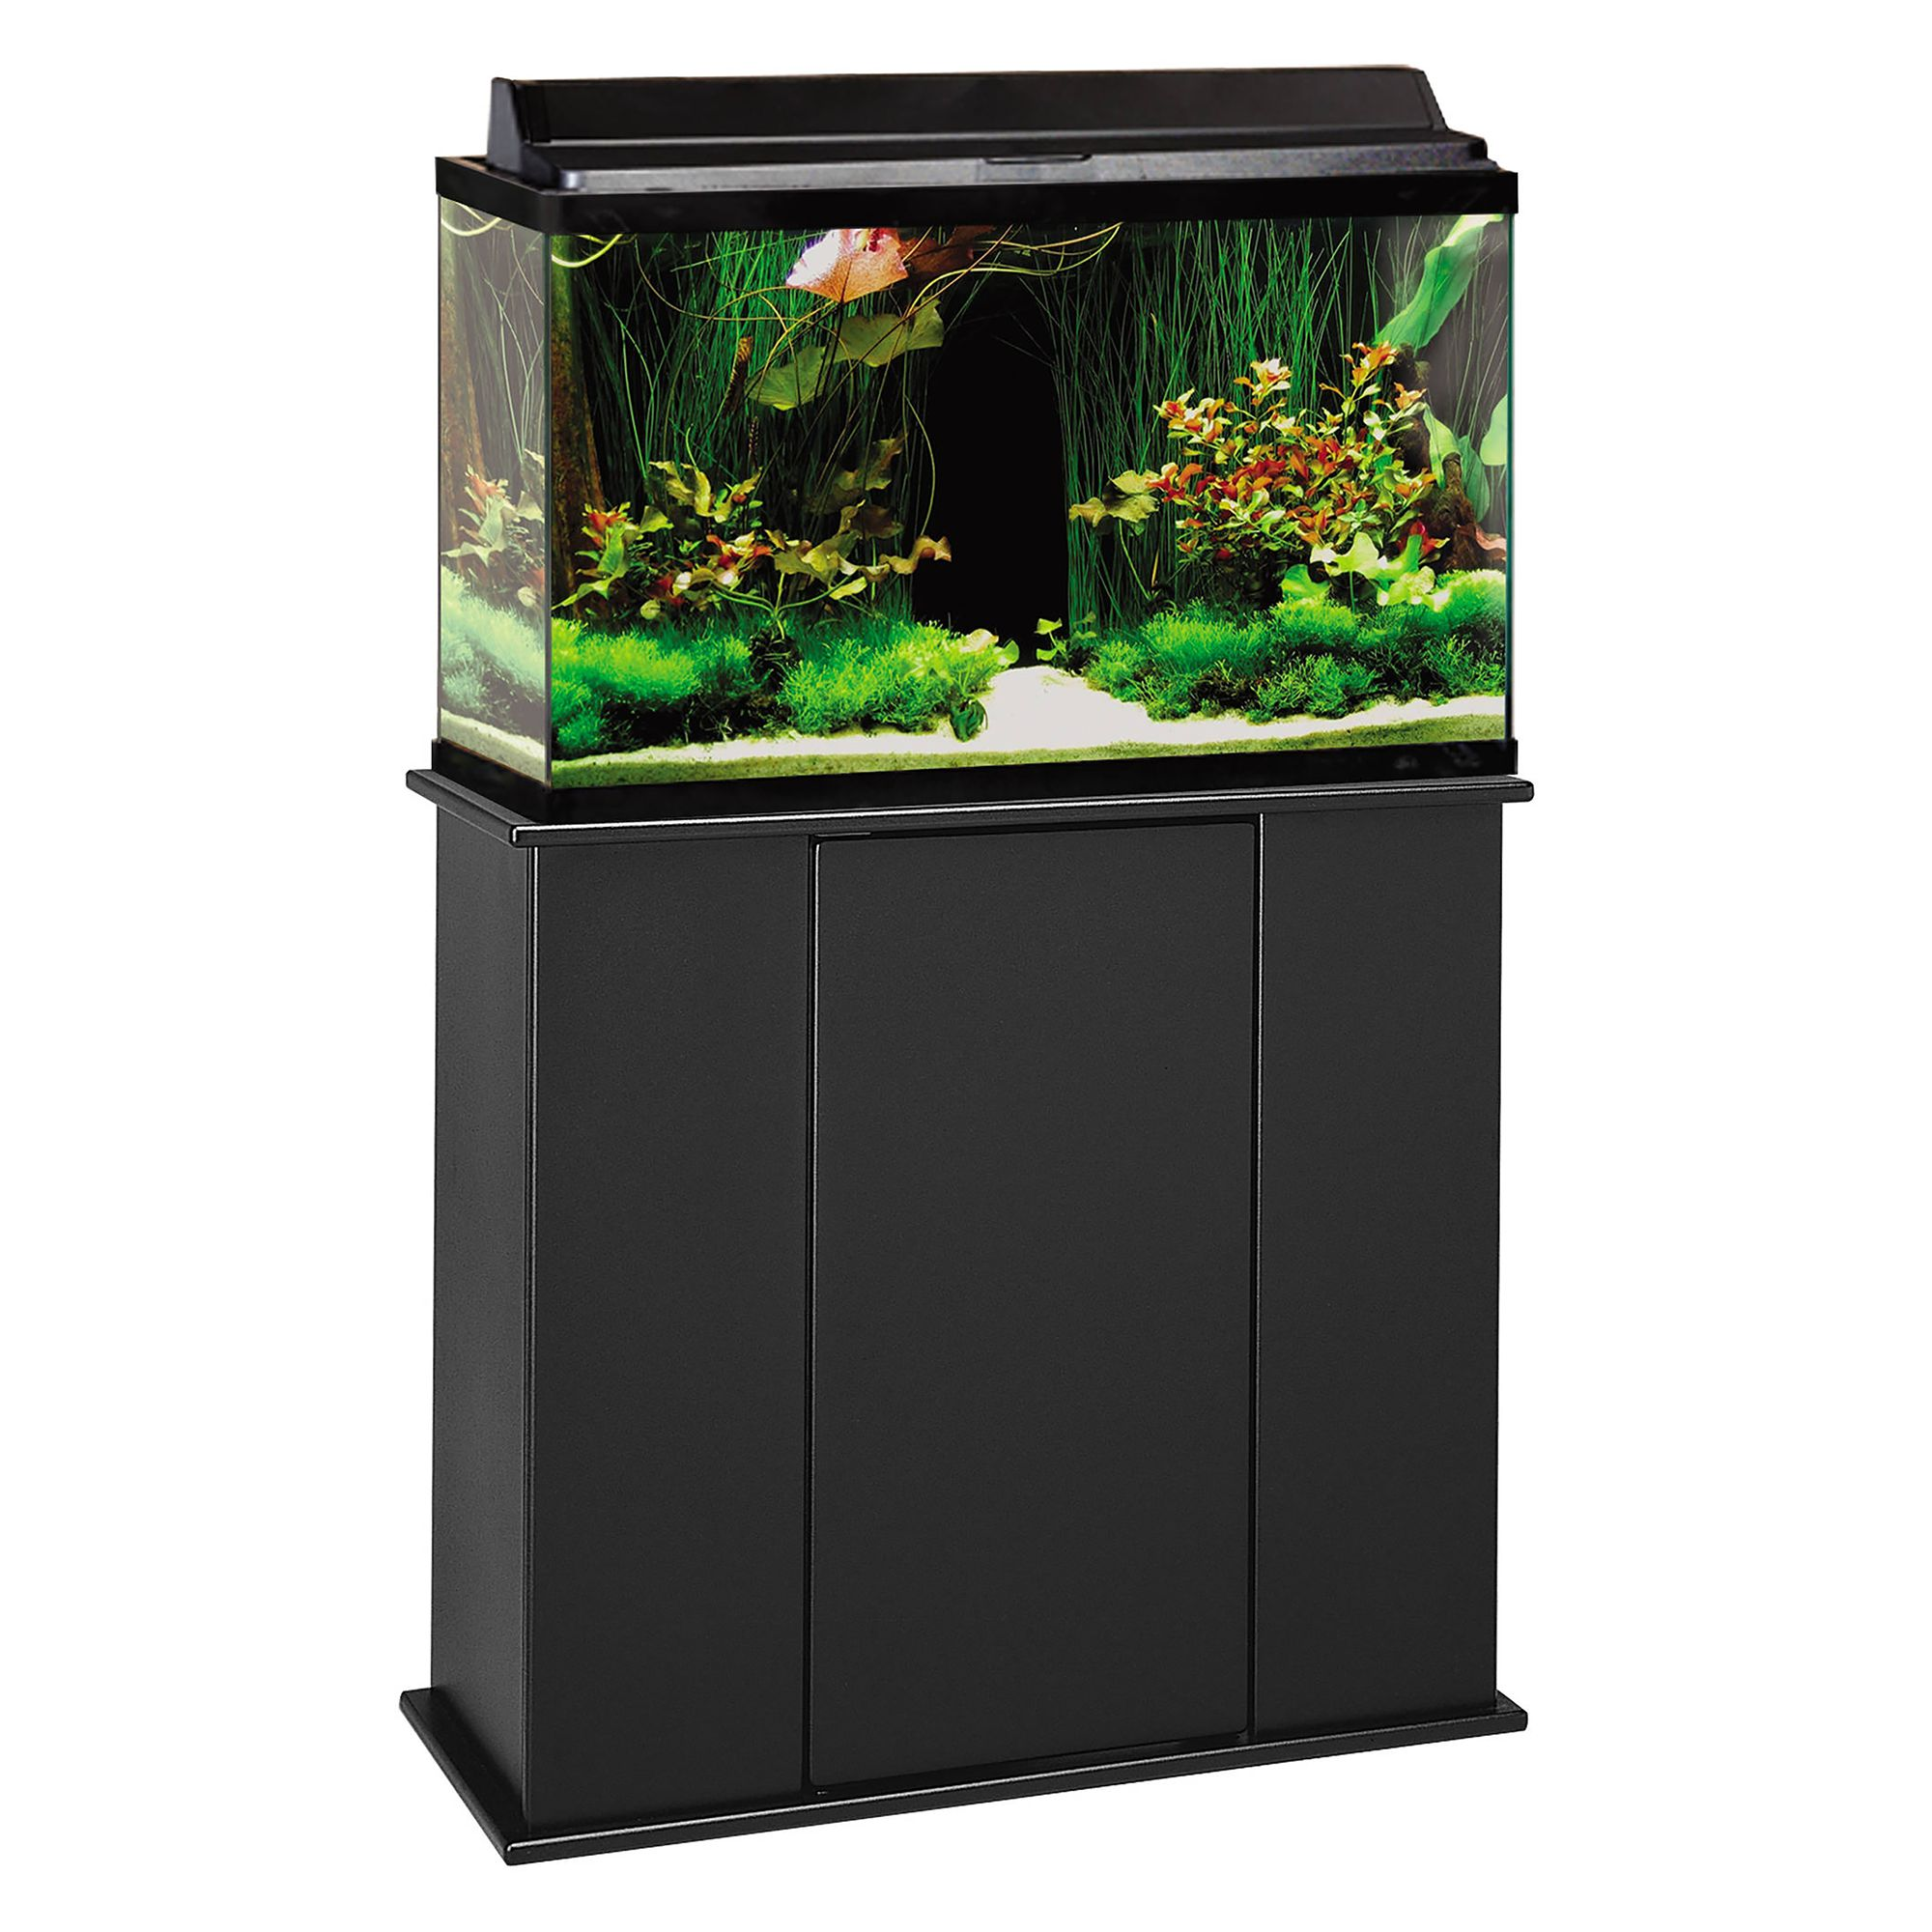 marco 29 gallon upright aquarium stand